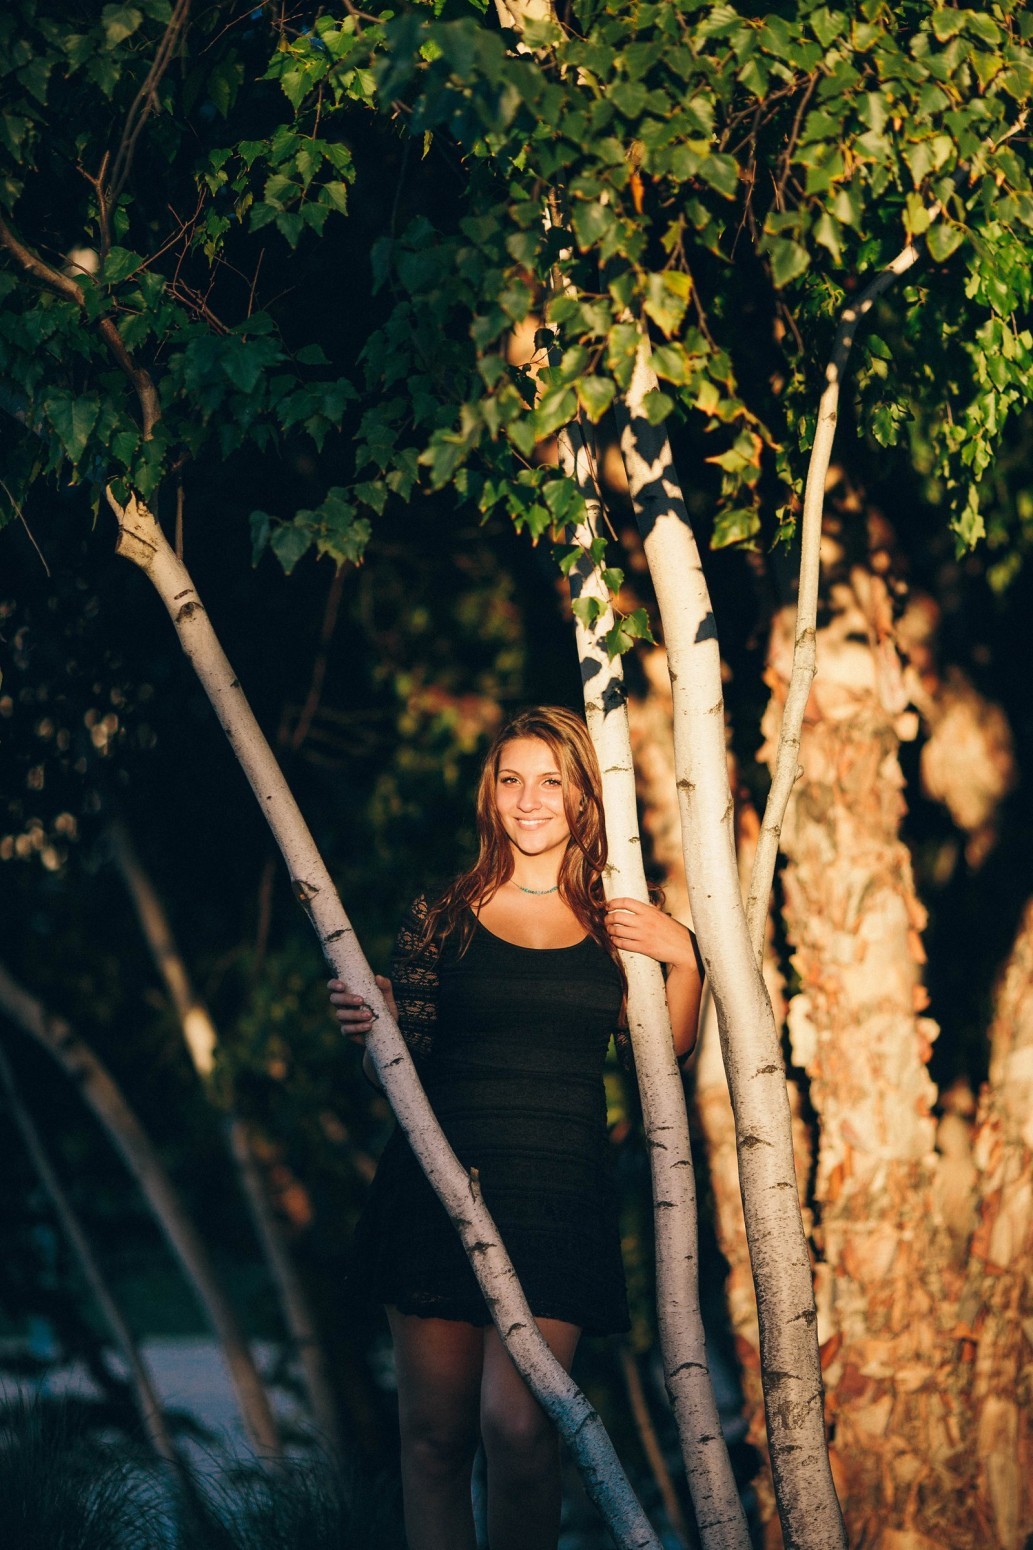 wild-native-photography-senior-portrait-photographer-pittsburgh-nadia_0178